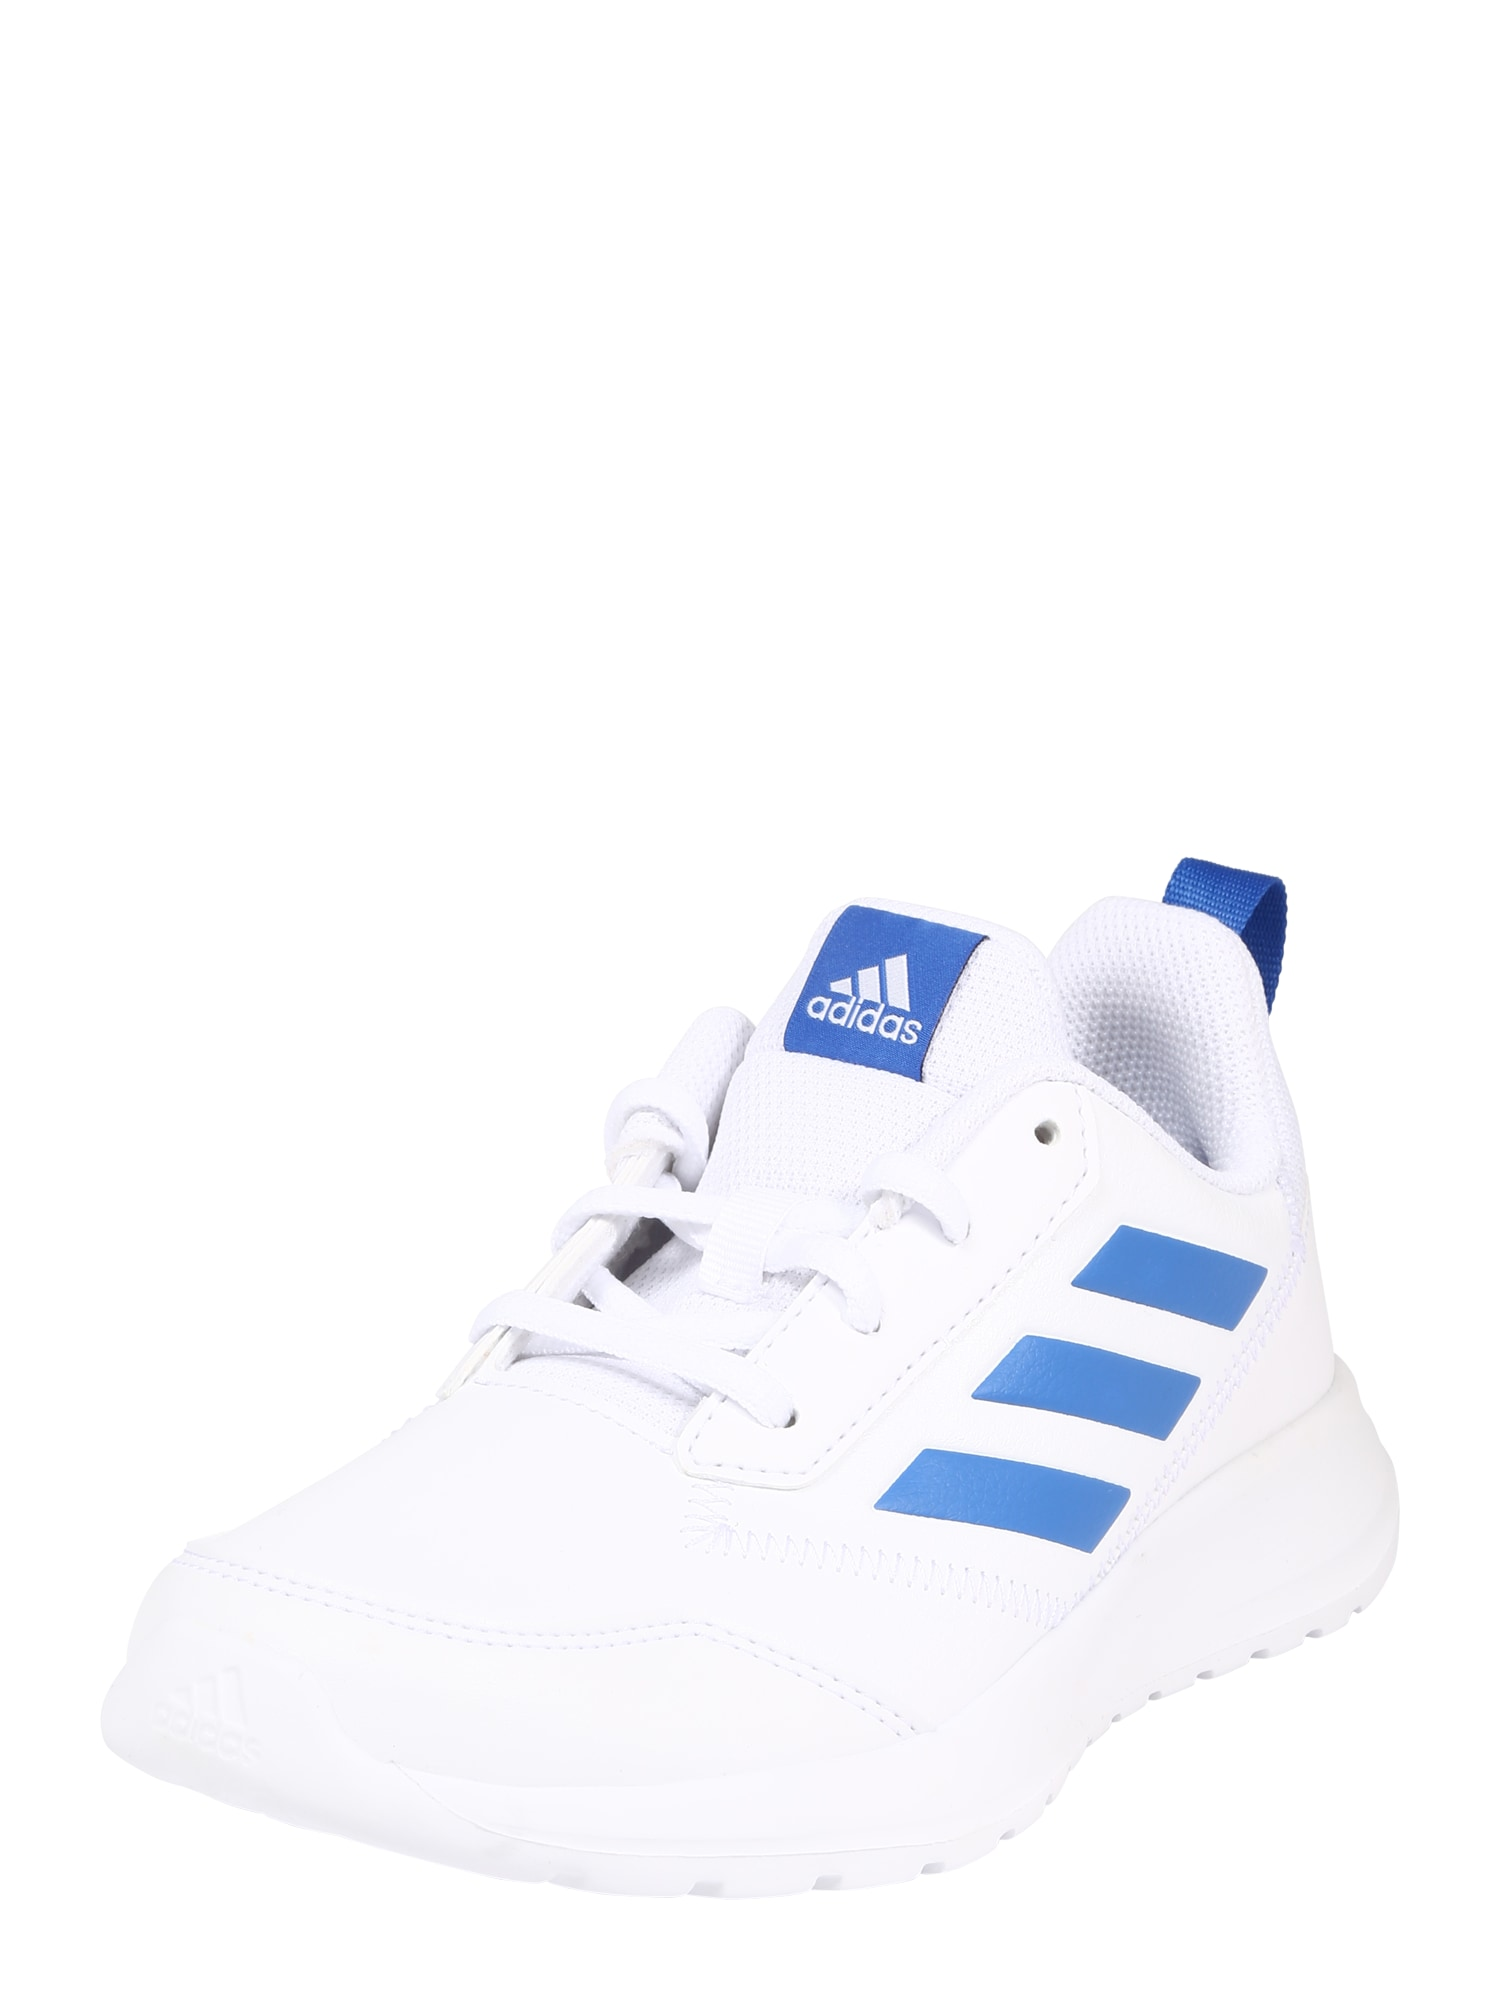 Sportovní boty Alta Run K modrá bílá ADIDAS PERFORMANCE